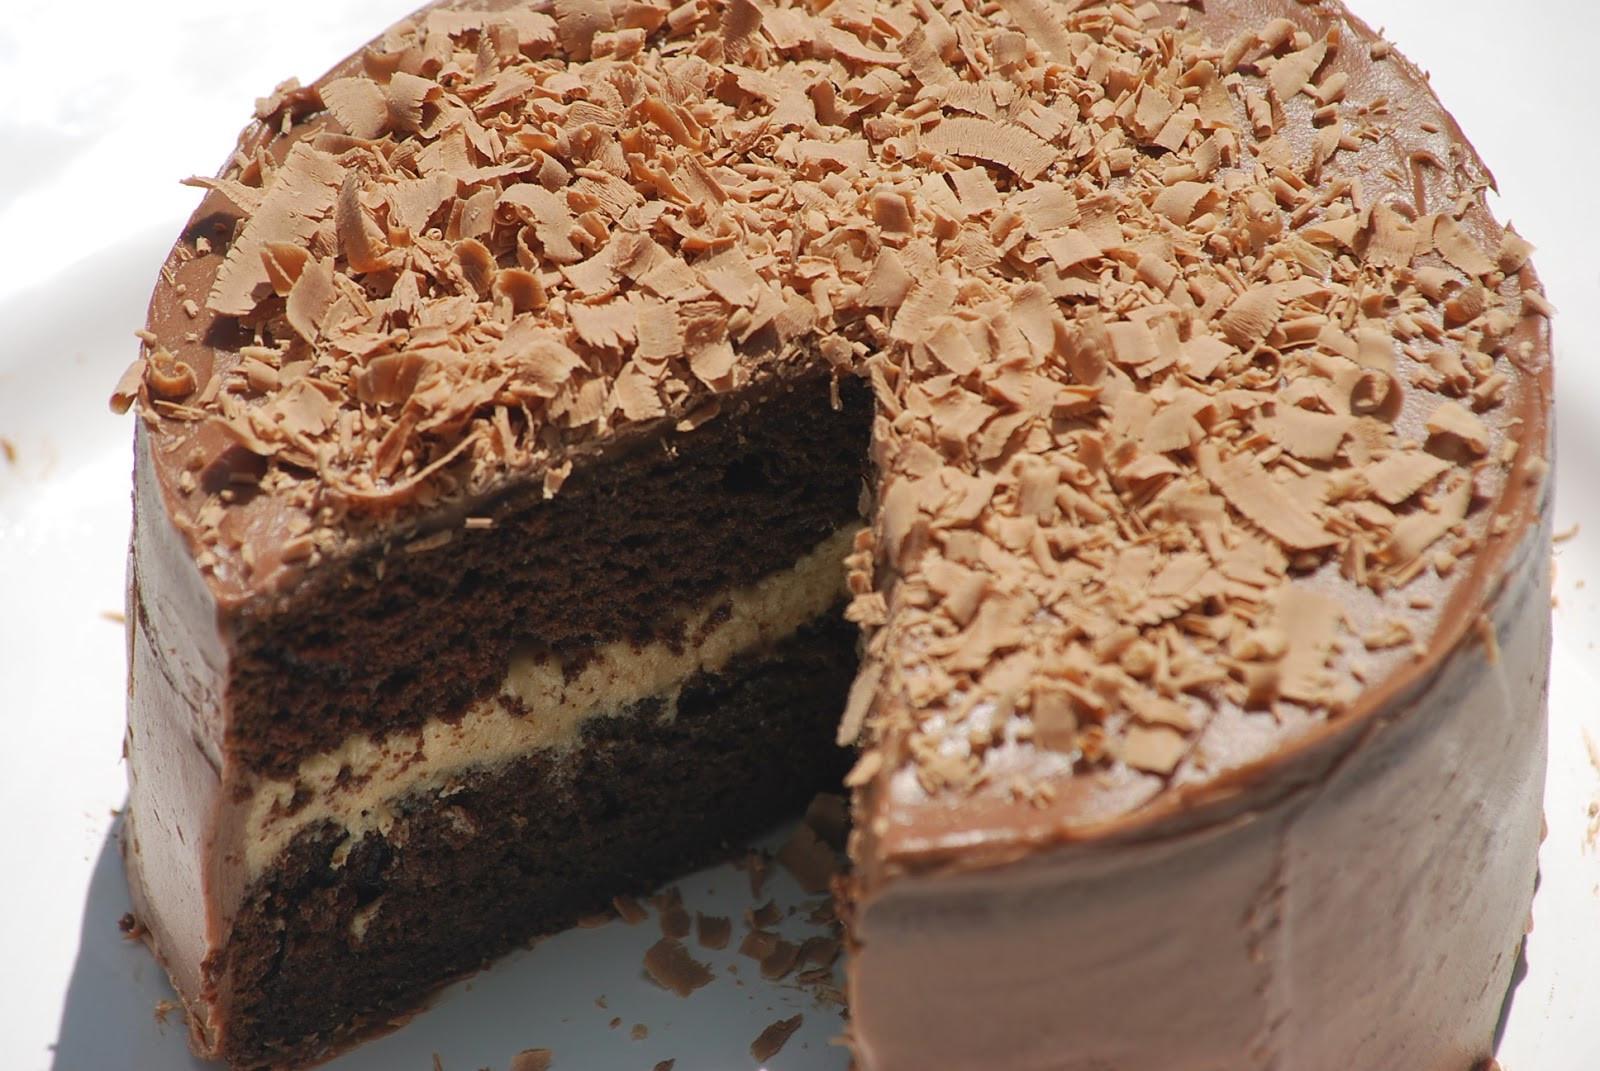 Gluten Free Cake Recipes  My story in recipes Gluten Free Chocolate Cake